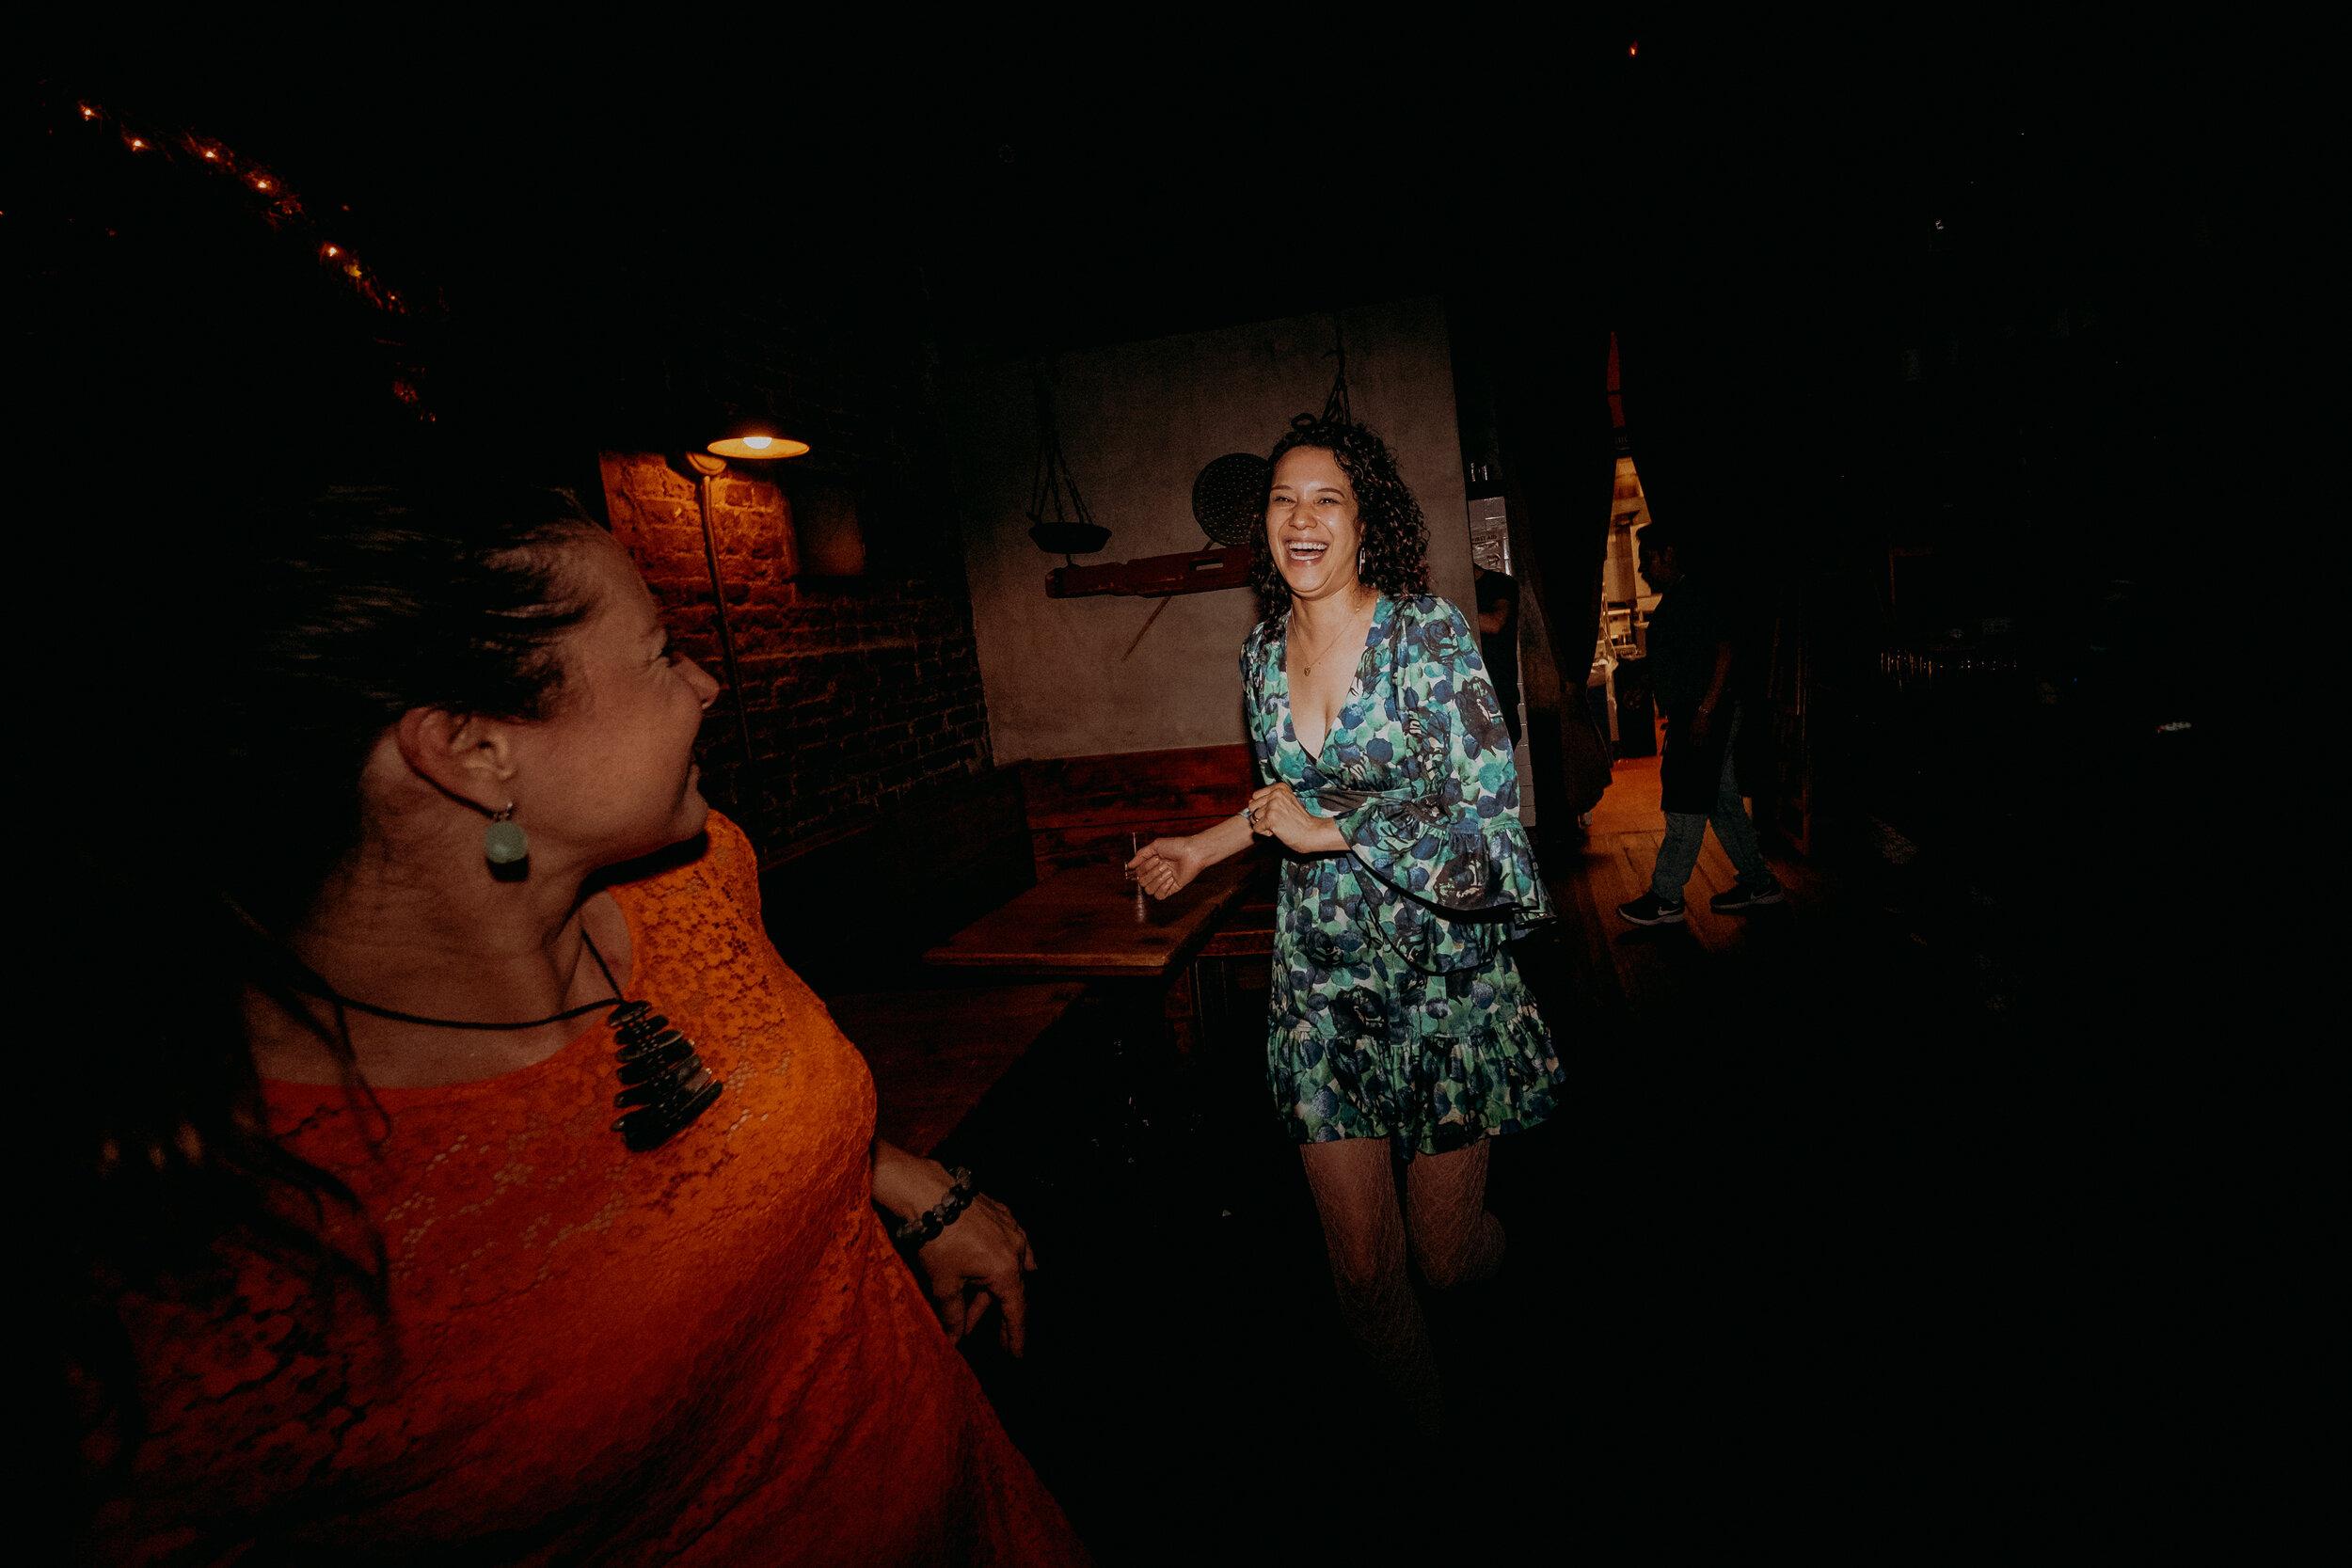 Aurora_Brooklyn_Wedding_Photographer_Chellise_Michael_Photography-571.jpg